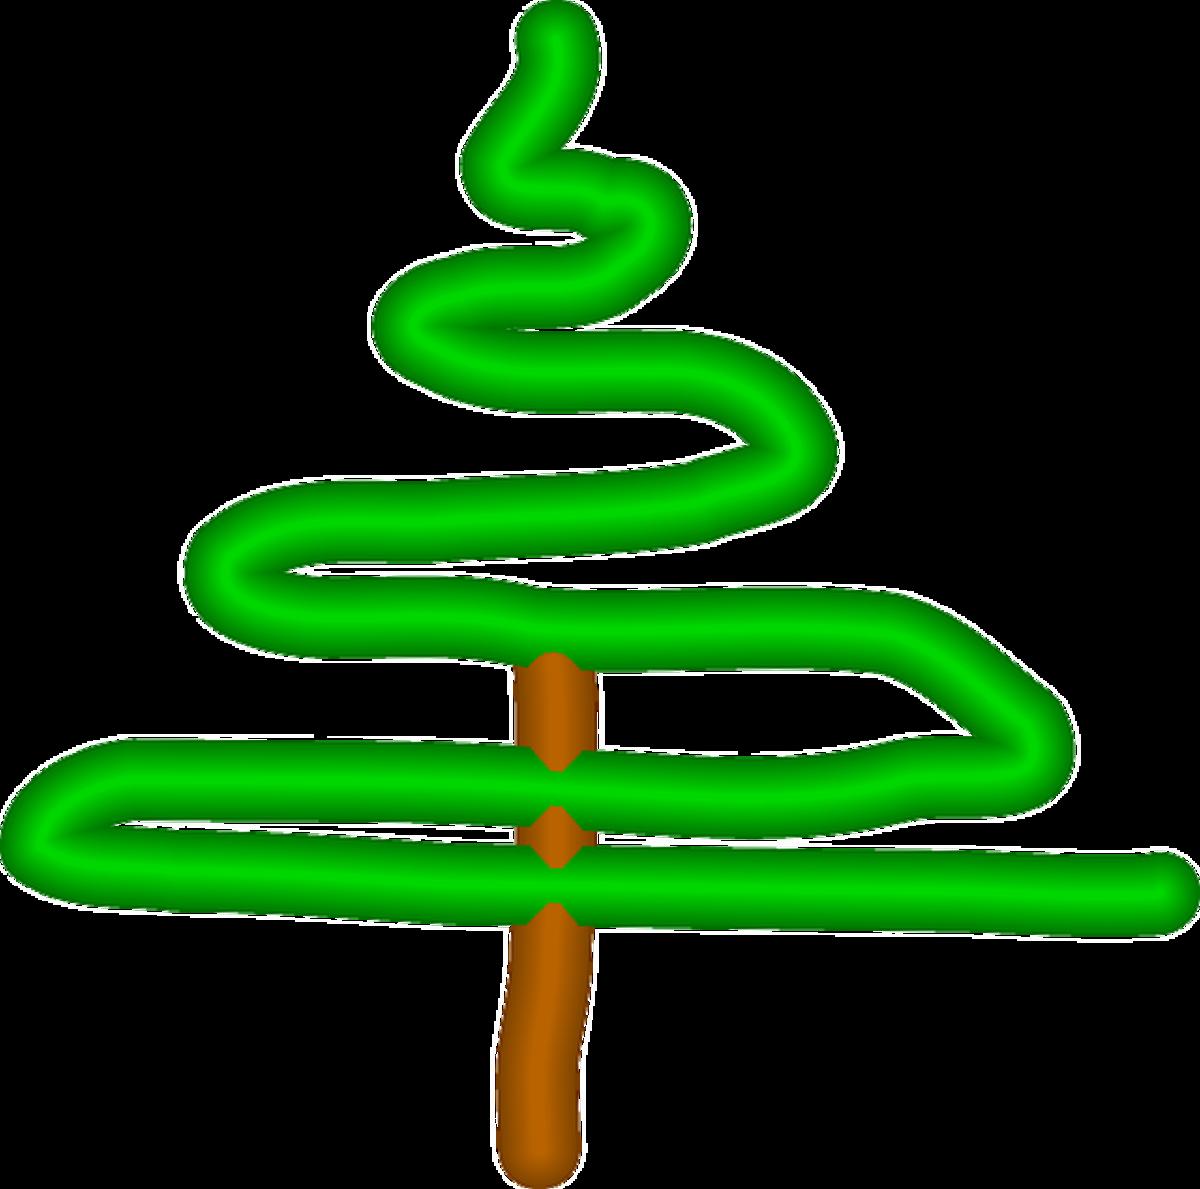 Pine Tree Scribble